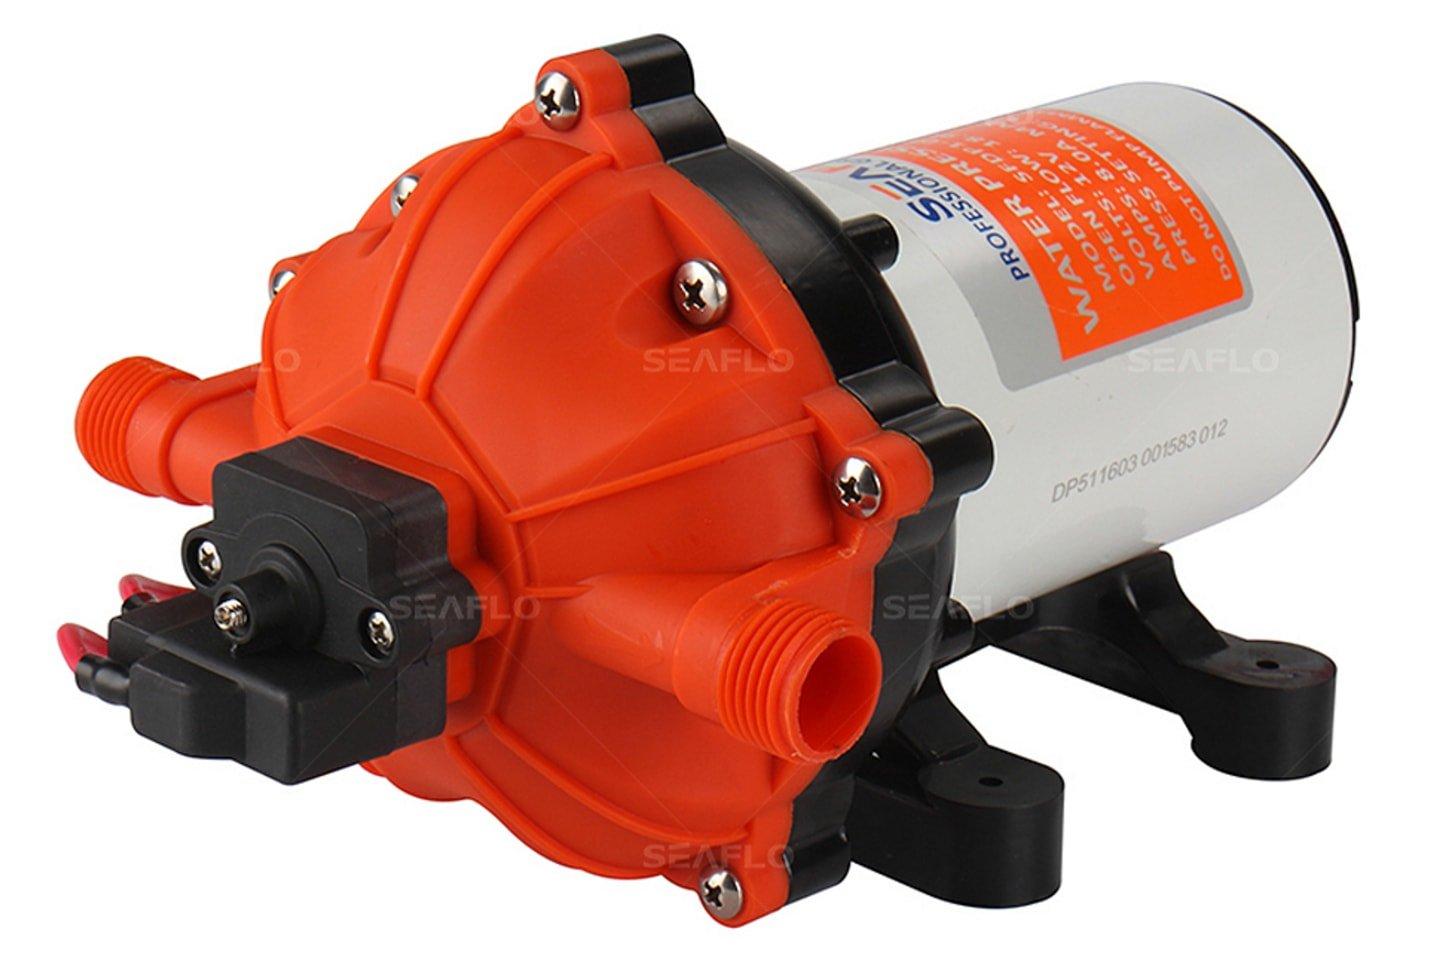 SEAFLO 12V 5.5 GPM 60 PSI Water Diaphragm Pressure Pump by SEAFLO